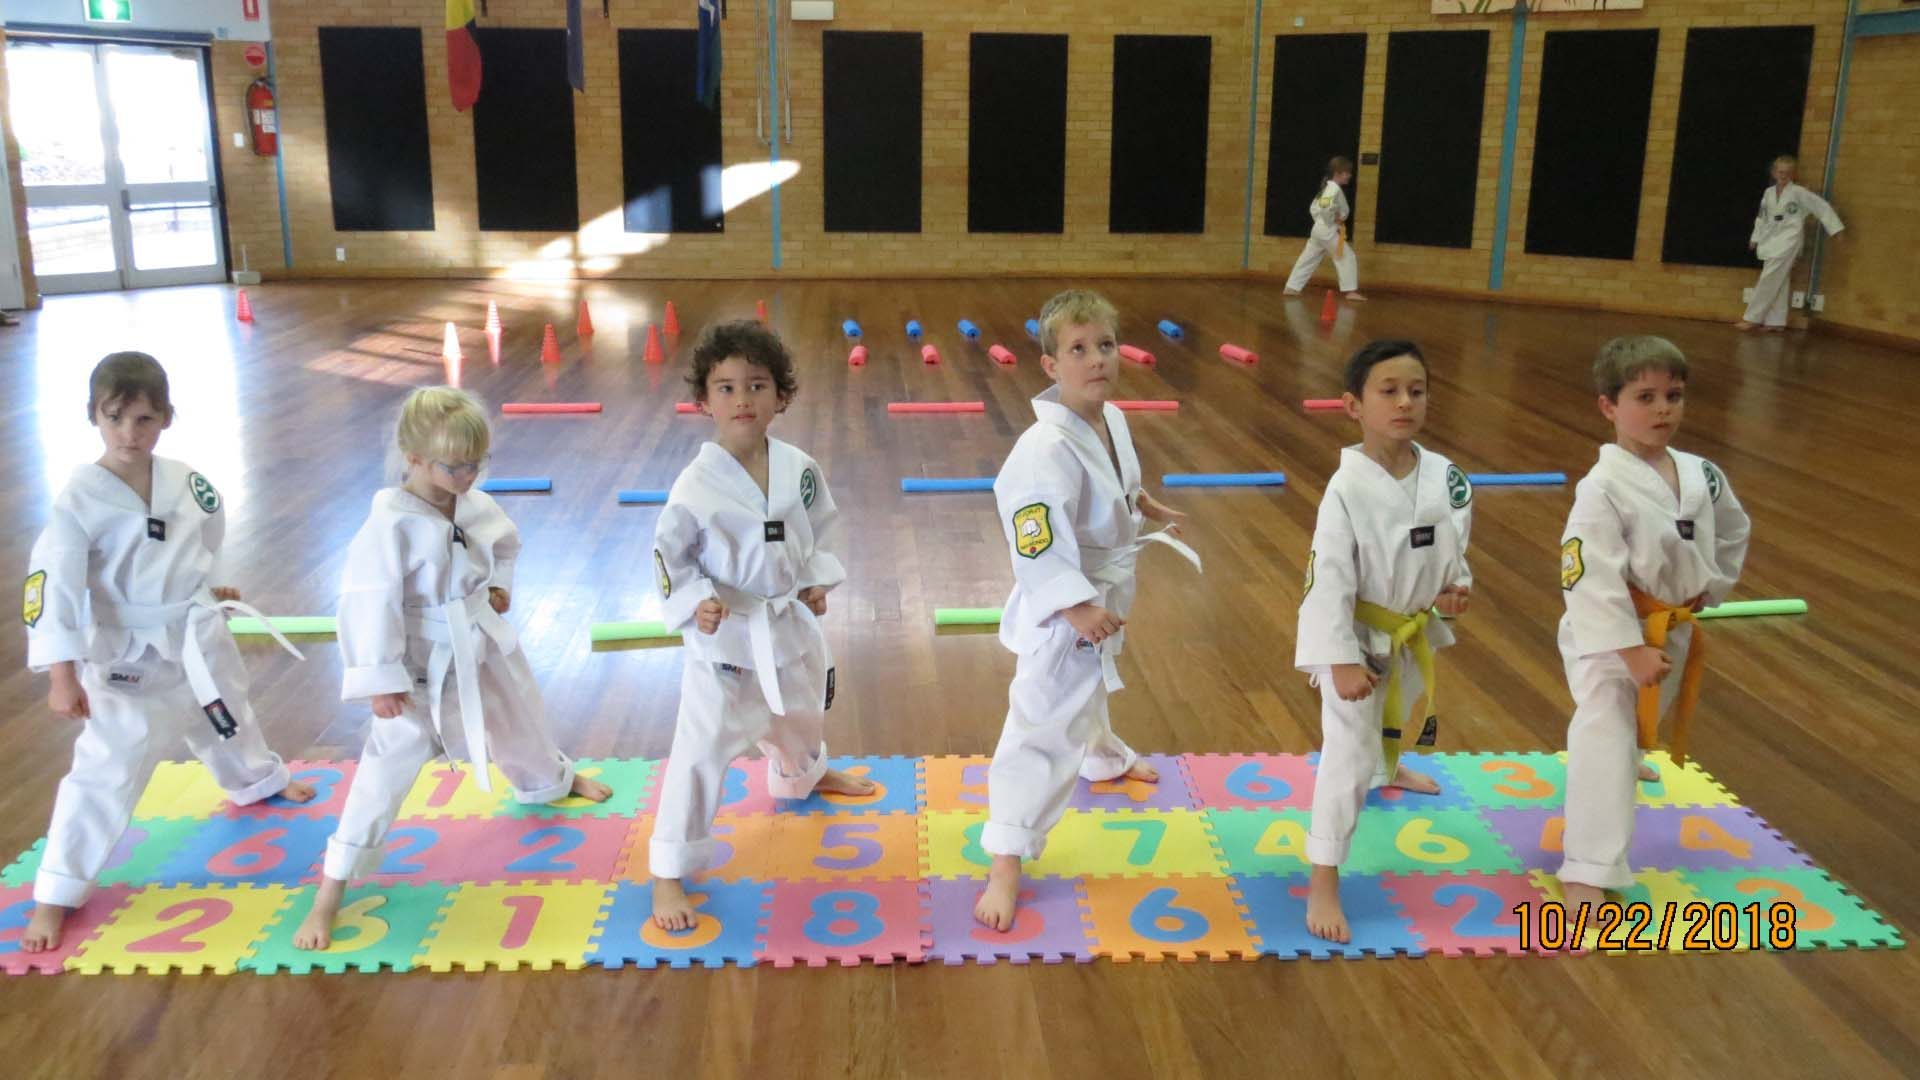 6 young taekwondo students practice martial arts inside a Tamworth gymnasium.